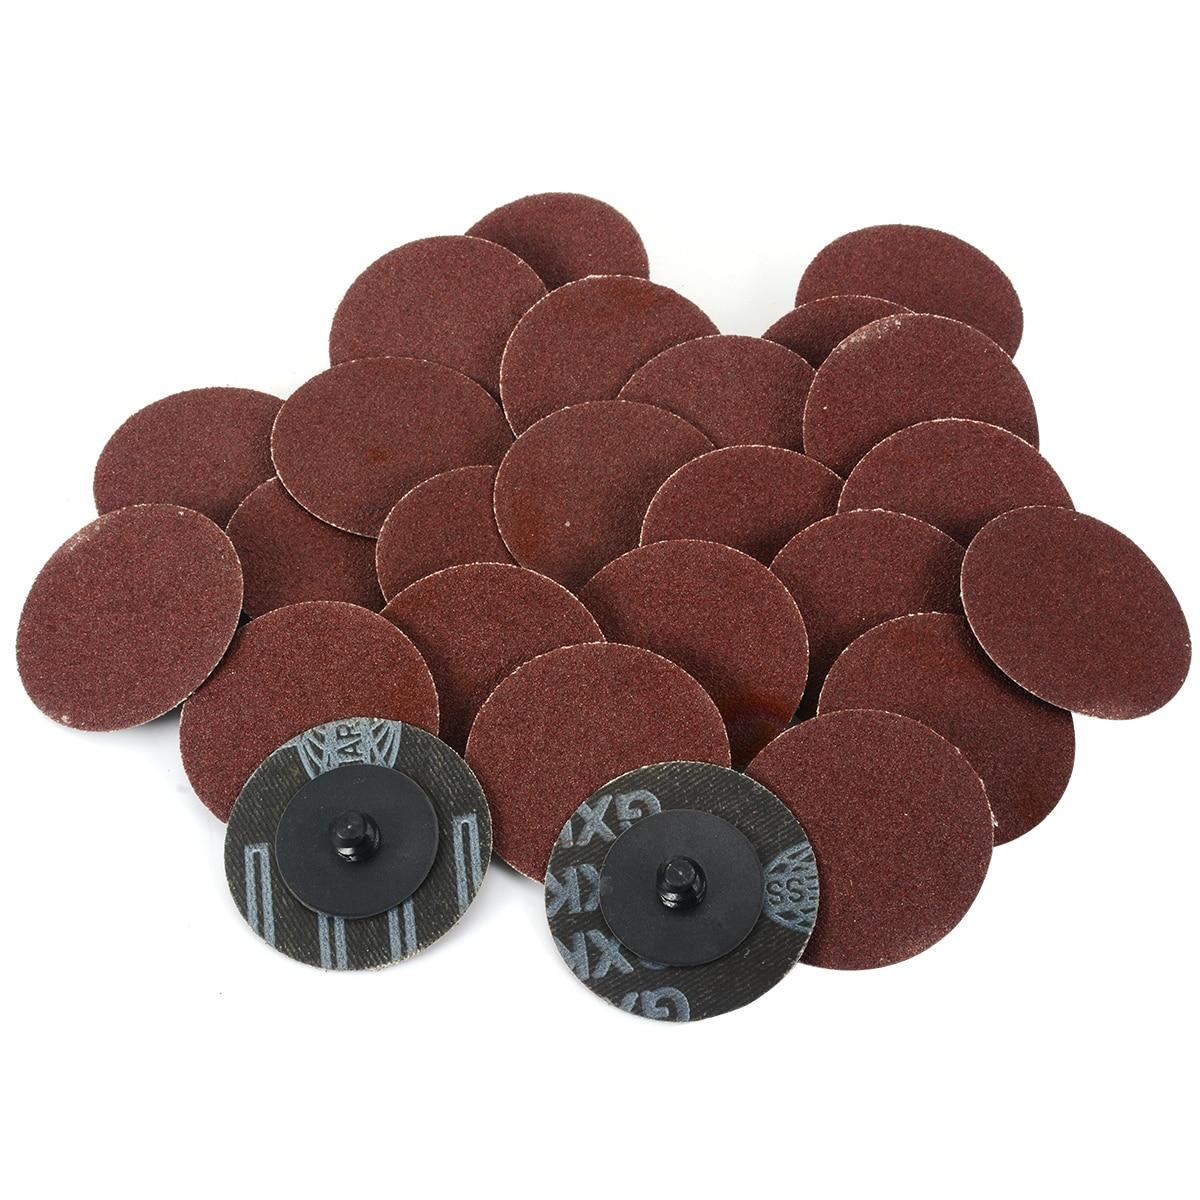 25PCS 180 Grit 2'' Inch Roloc Roll Lock Sanding Disc Sandpaper Abrasive Pads Fot Processing Polishing Cars Metal Woodwork